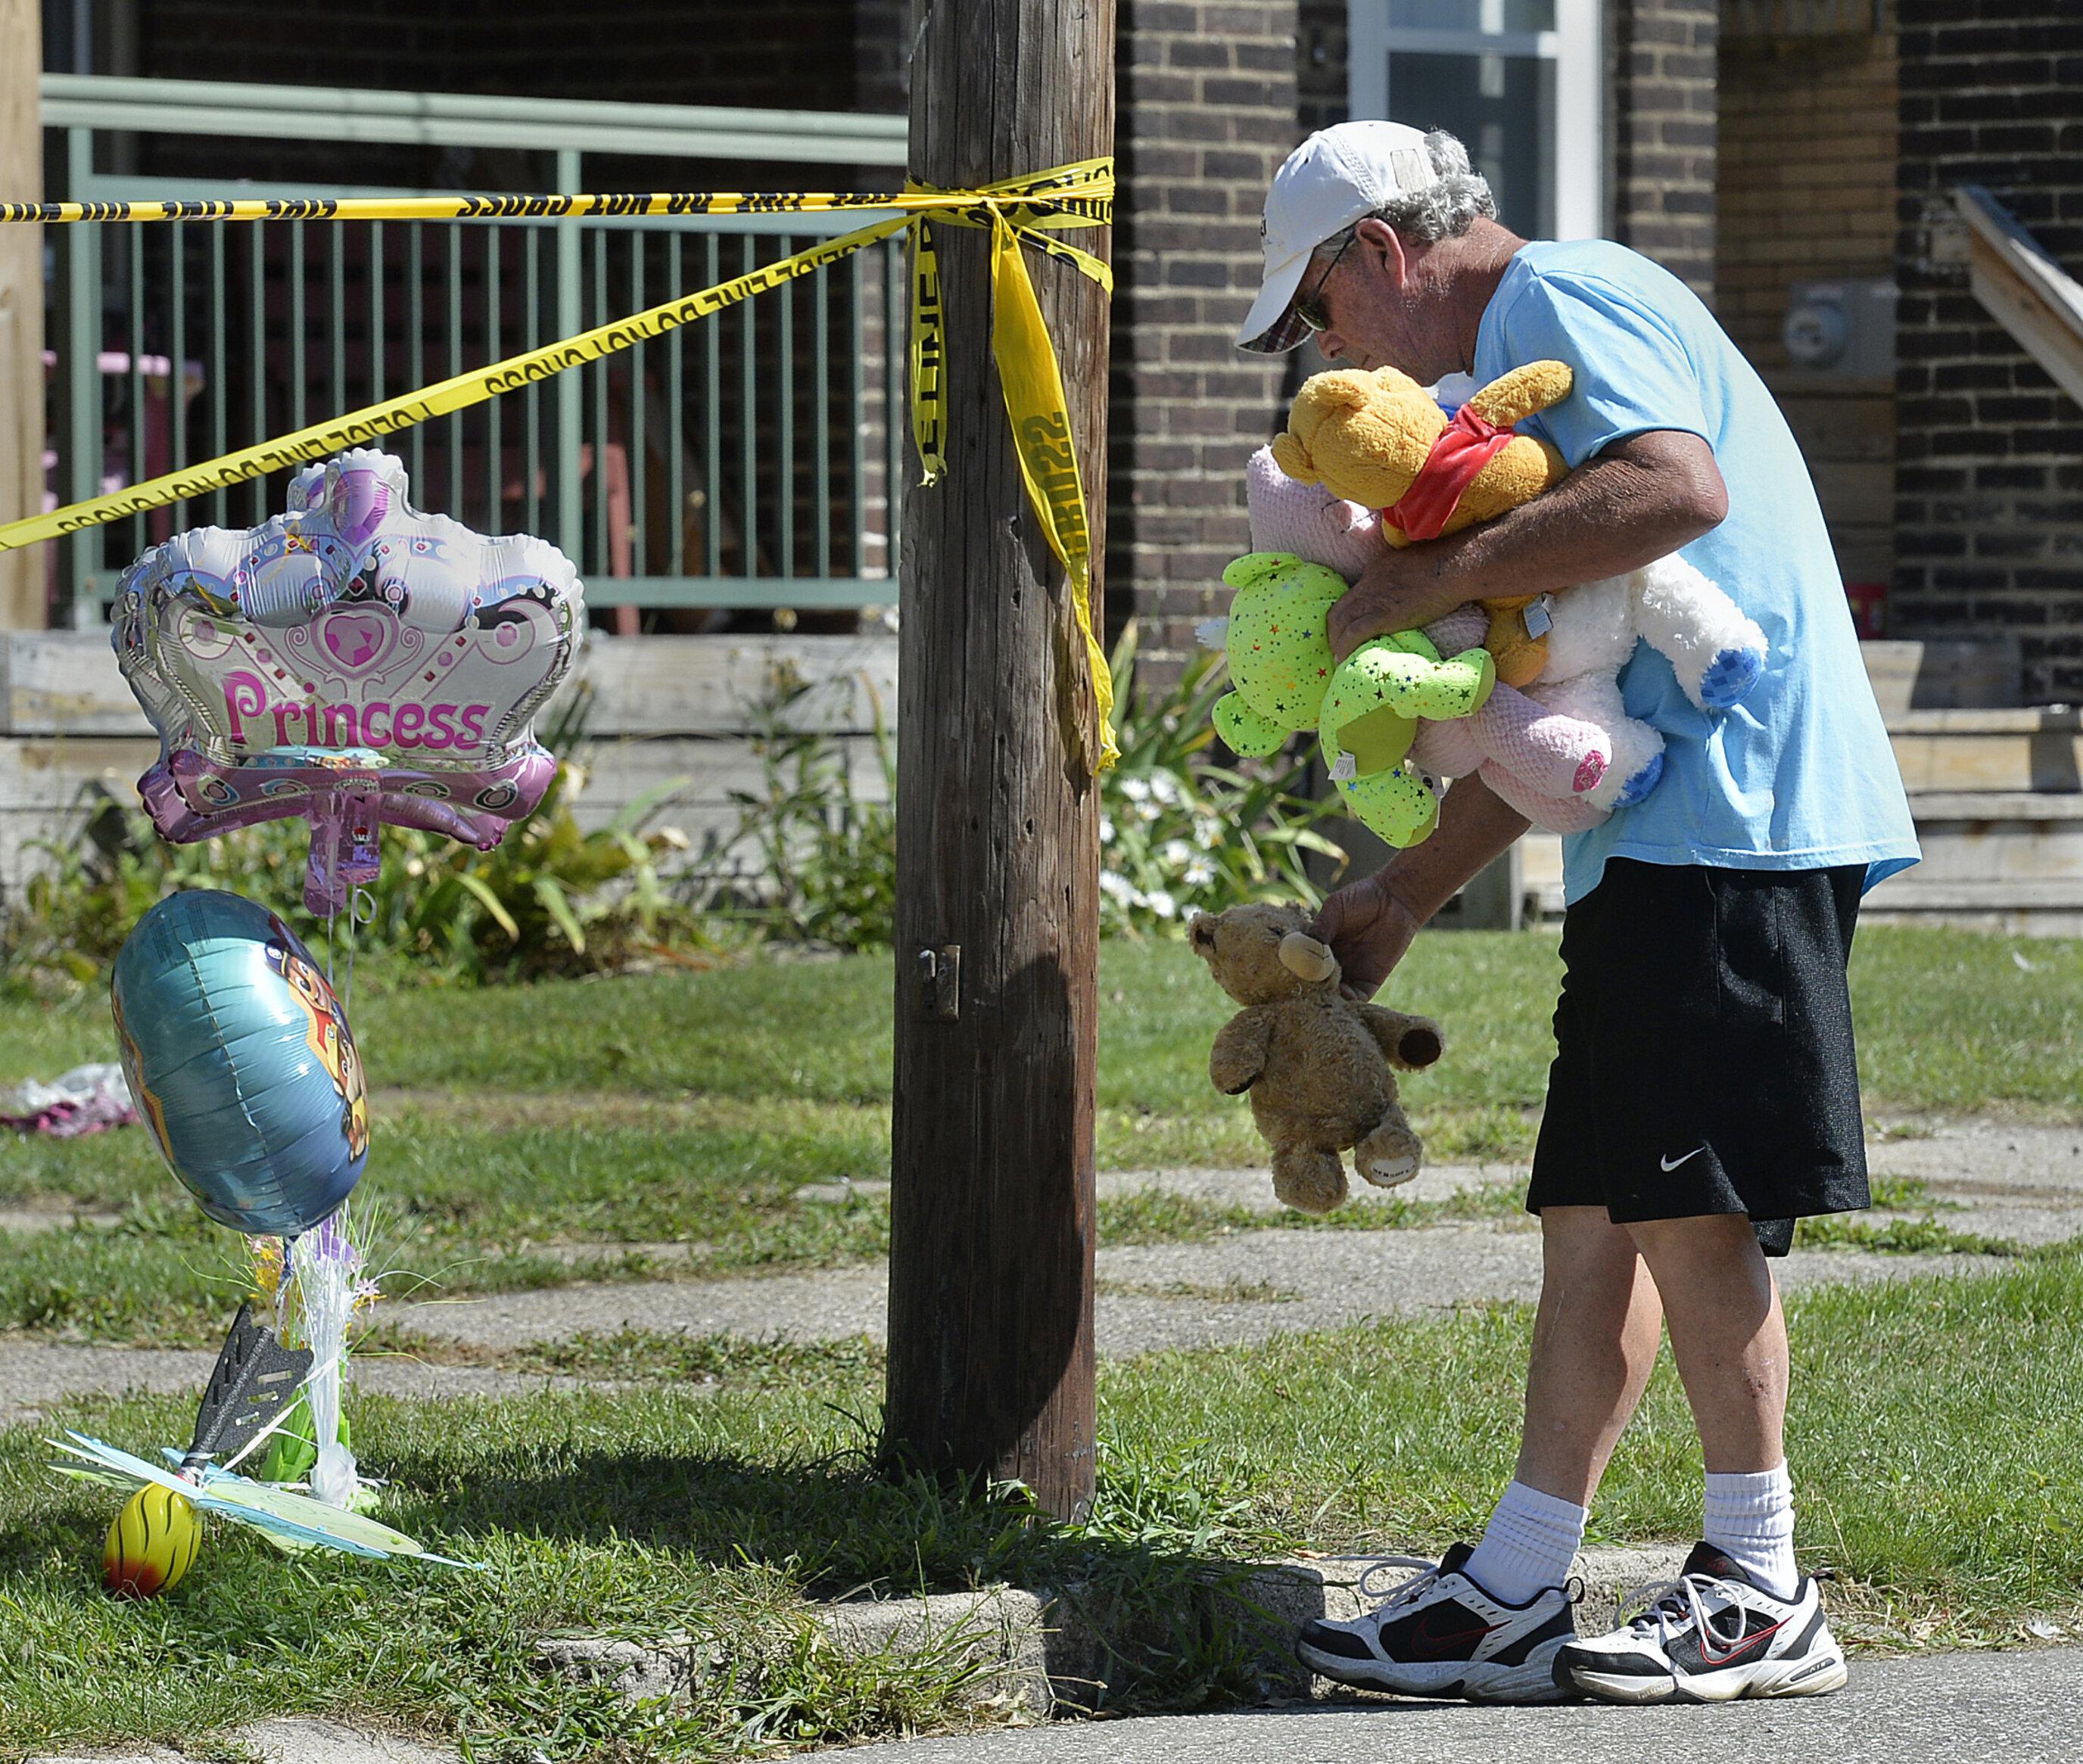 Fire At Pennsylvania Day Care Kills 5 Children